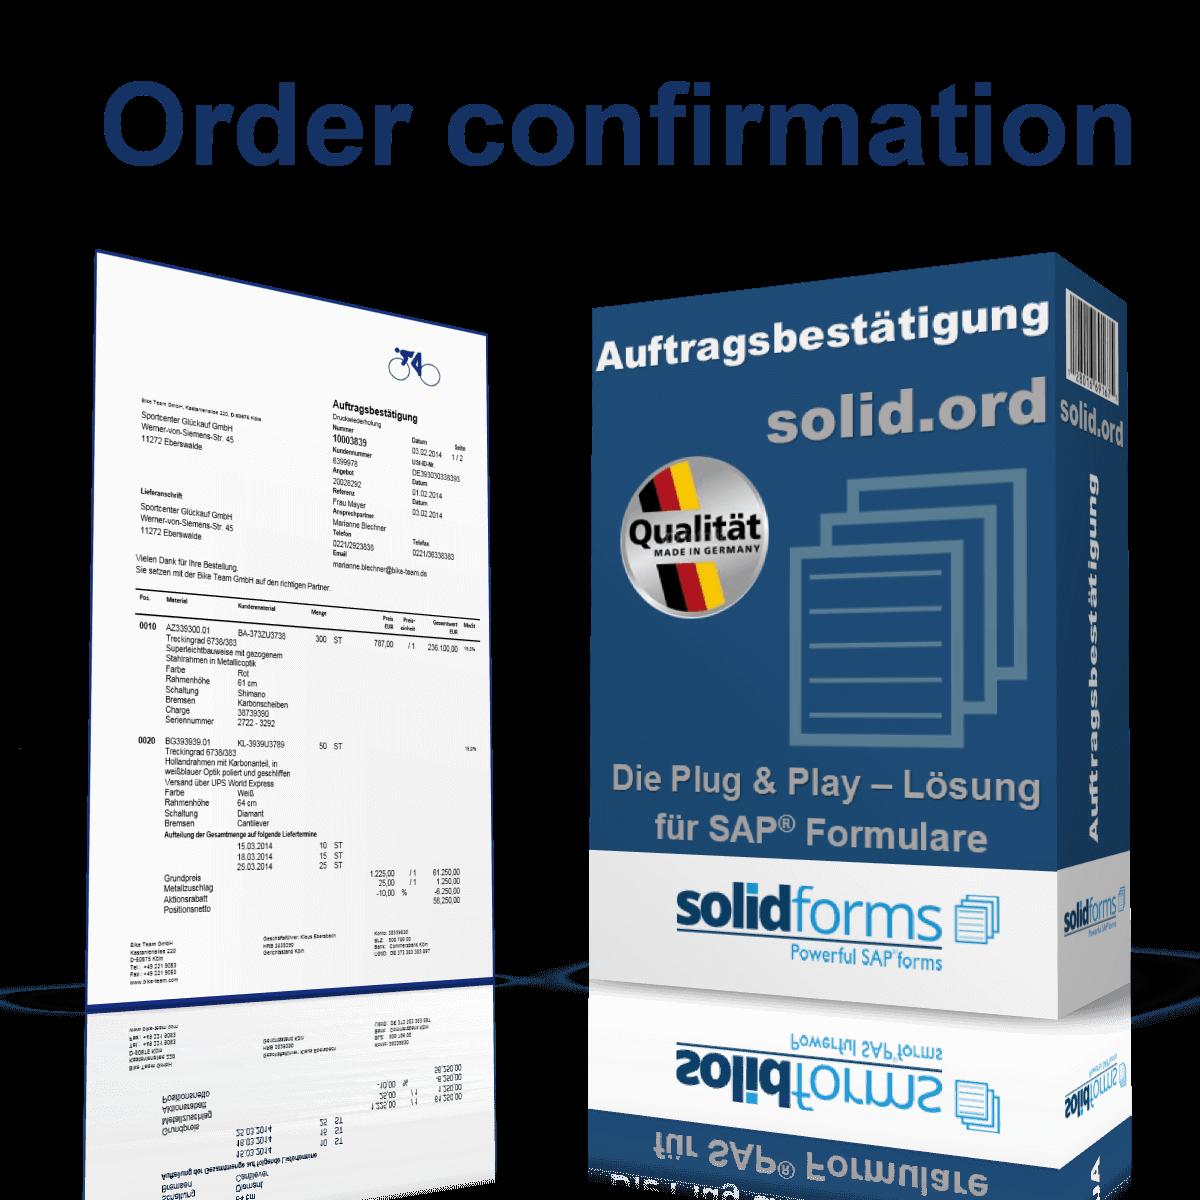 SAP Adobe Form Order confirmation | solidforms